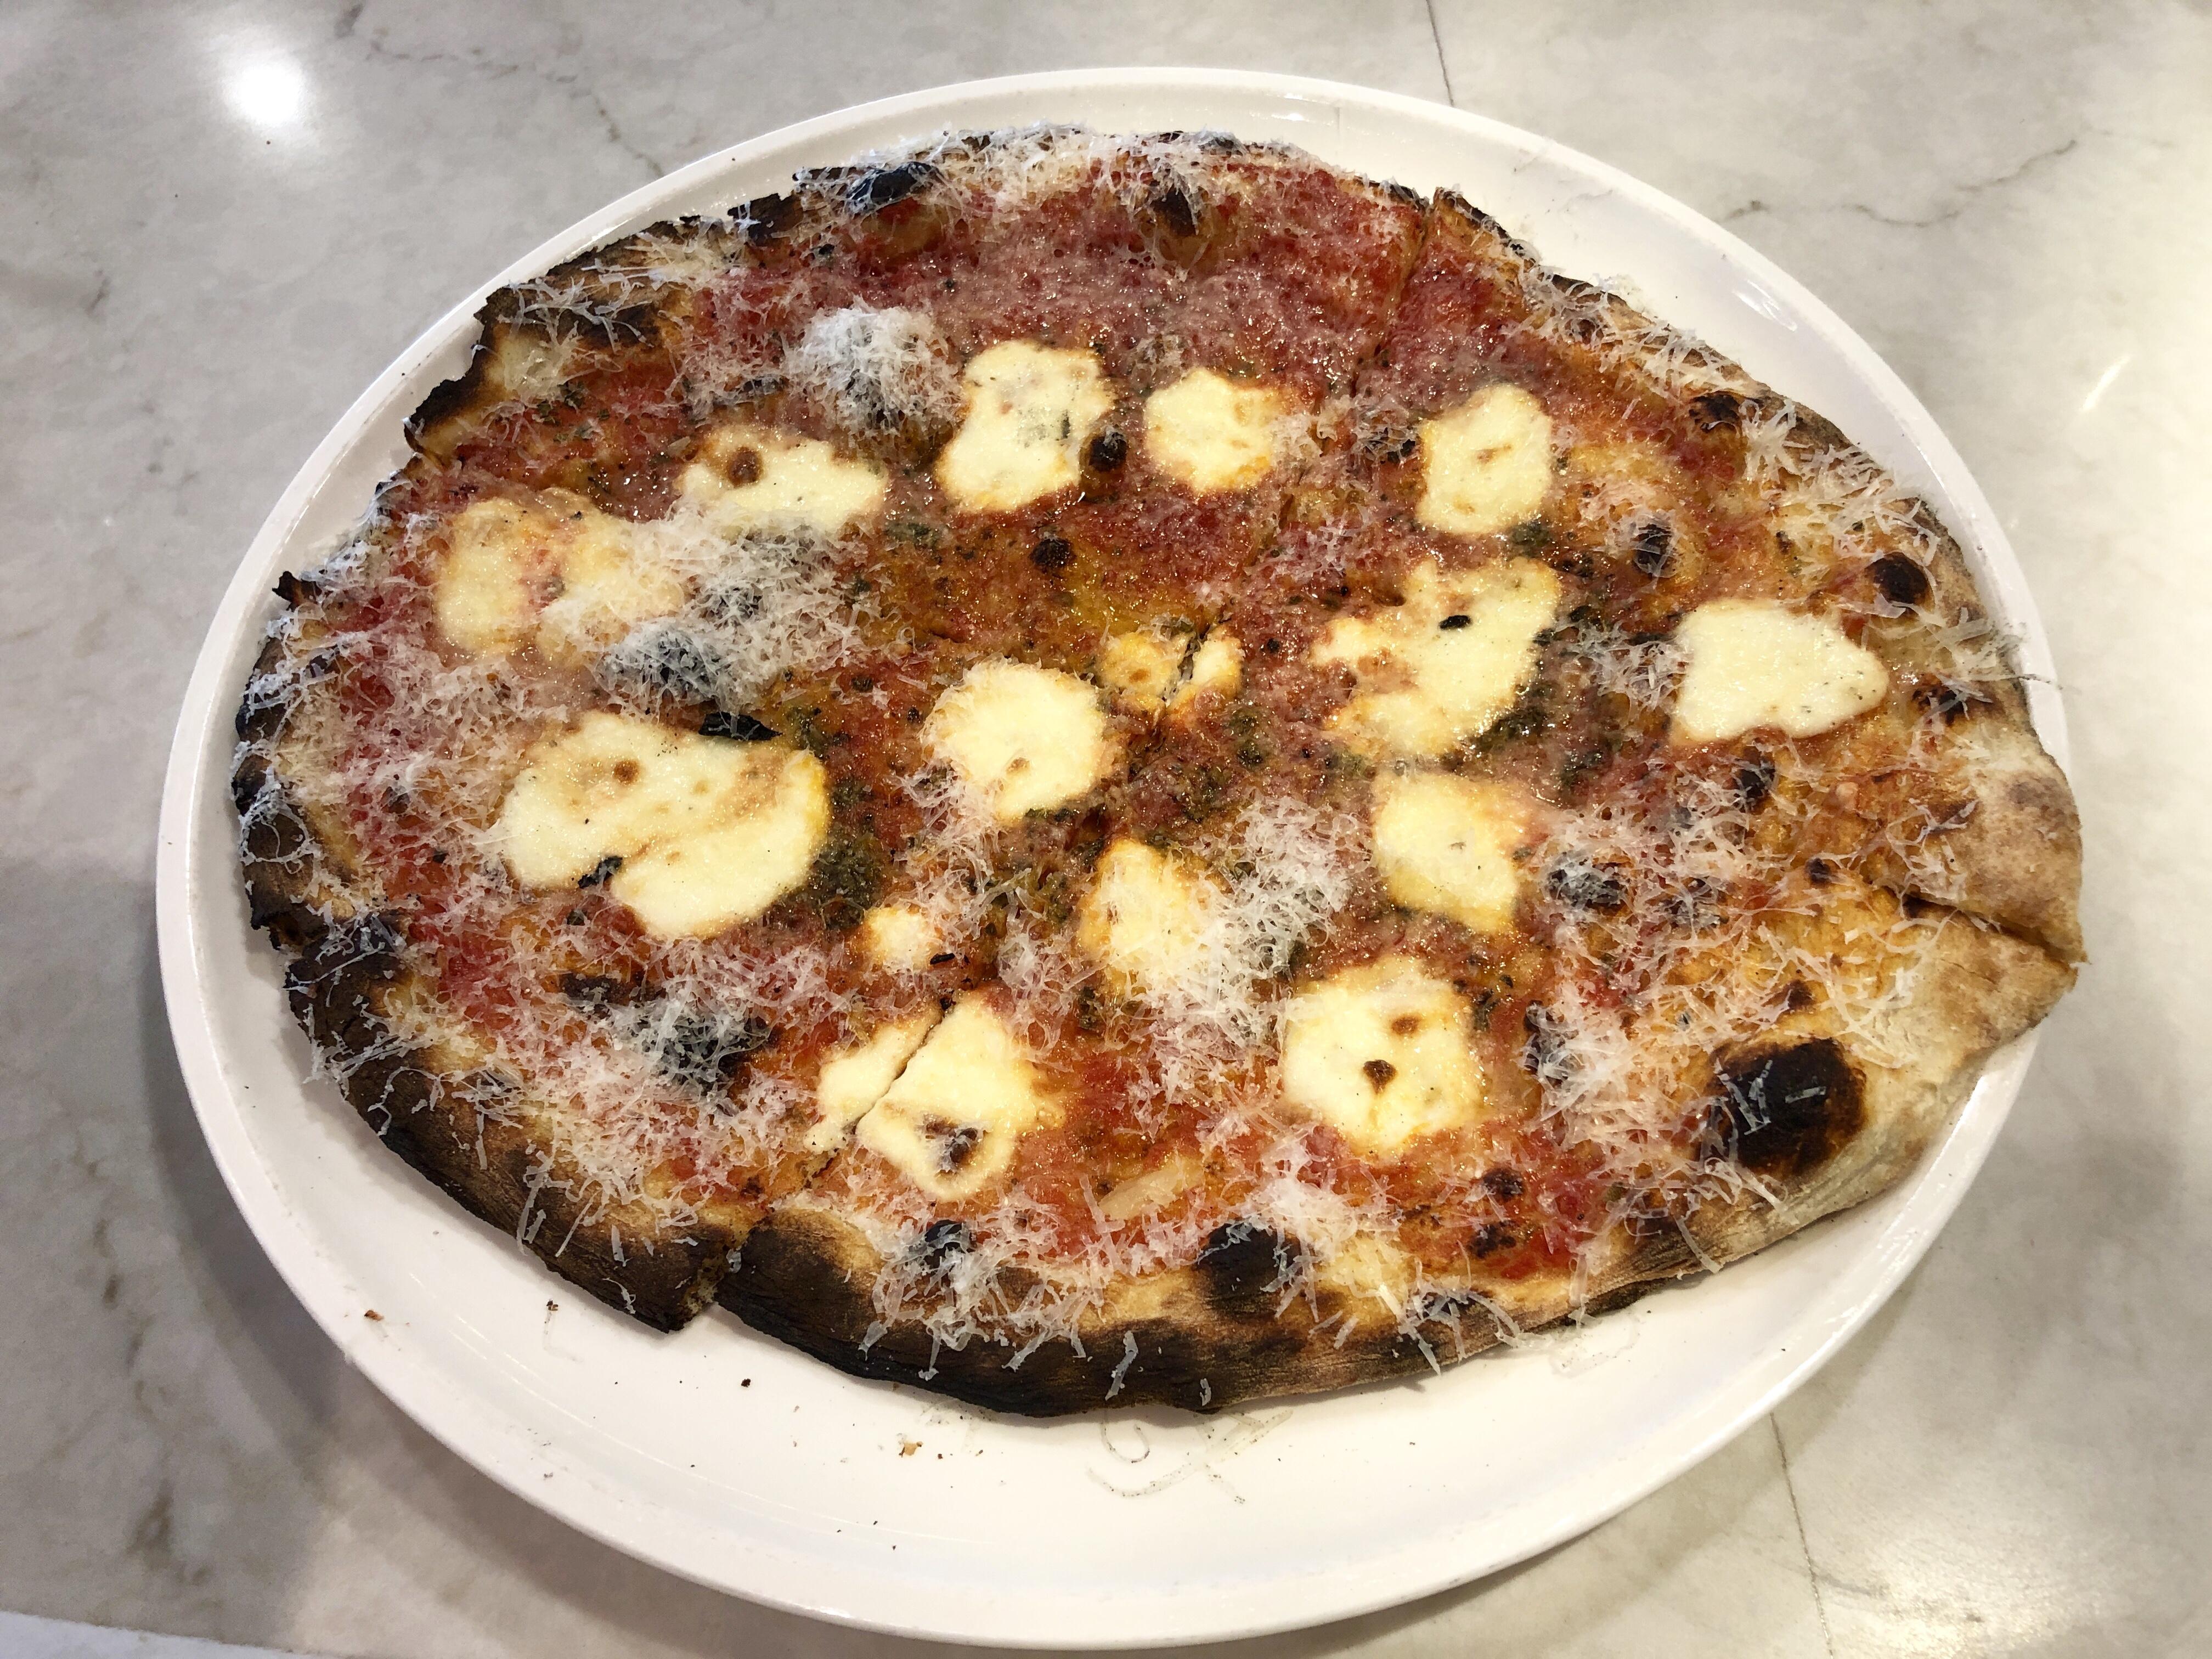 Pizza at Varasano's Pizza in the Hartsfield-Jackson airport in Atlanta